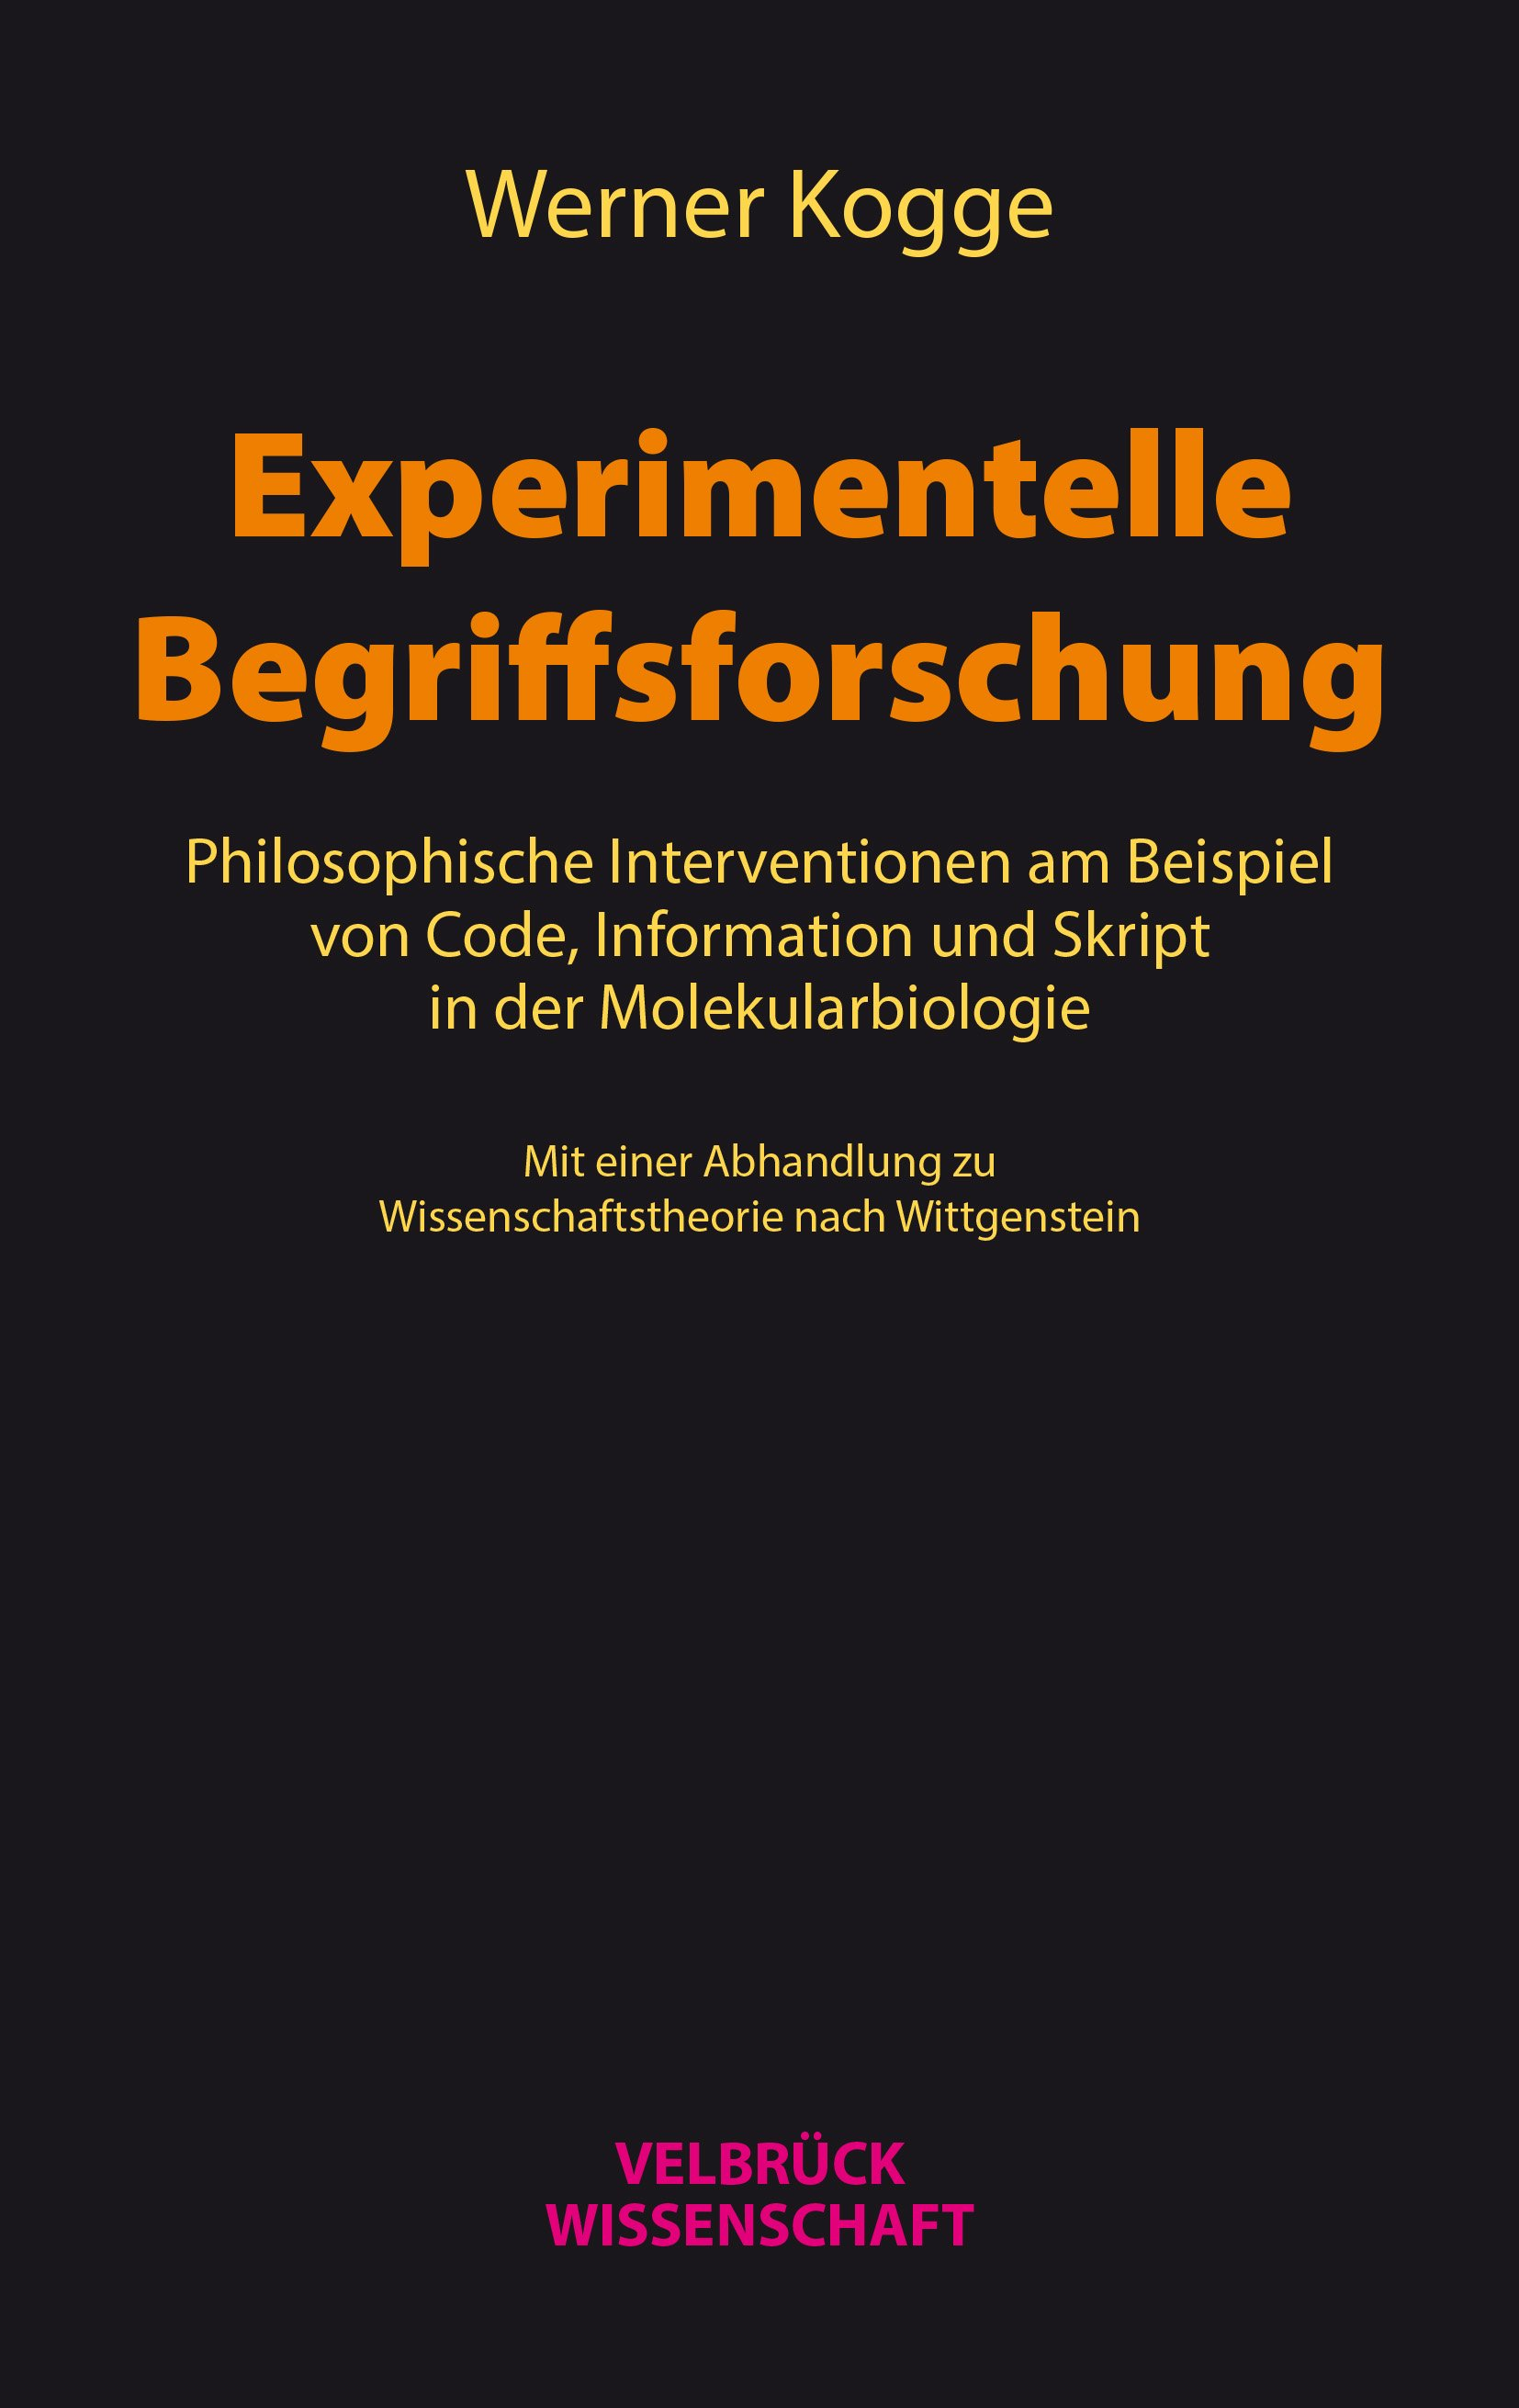 Werner Kogge: Experimentelle Begriffsforschung